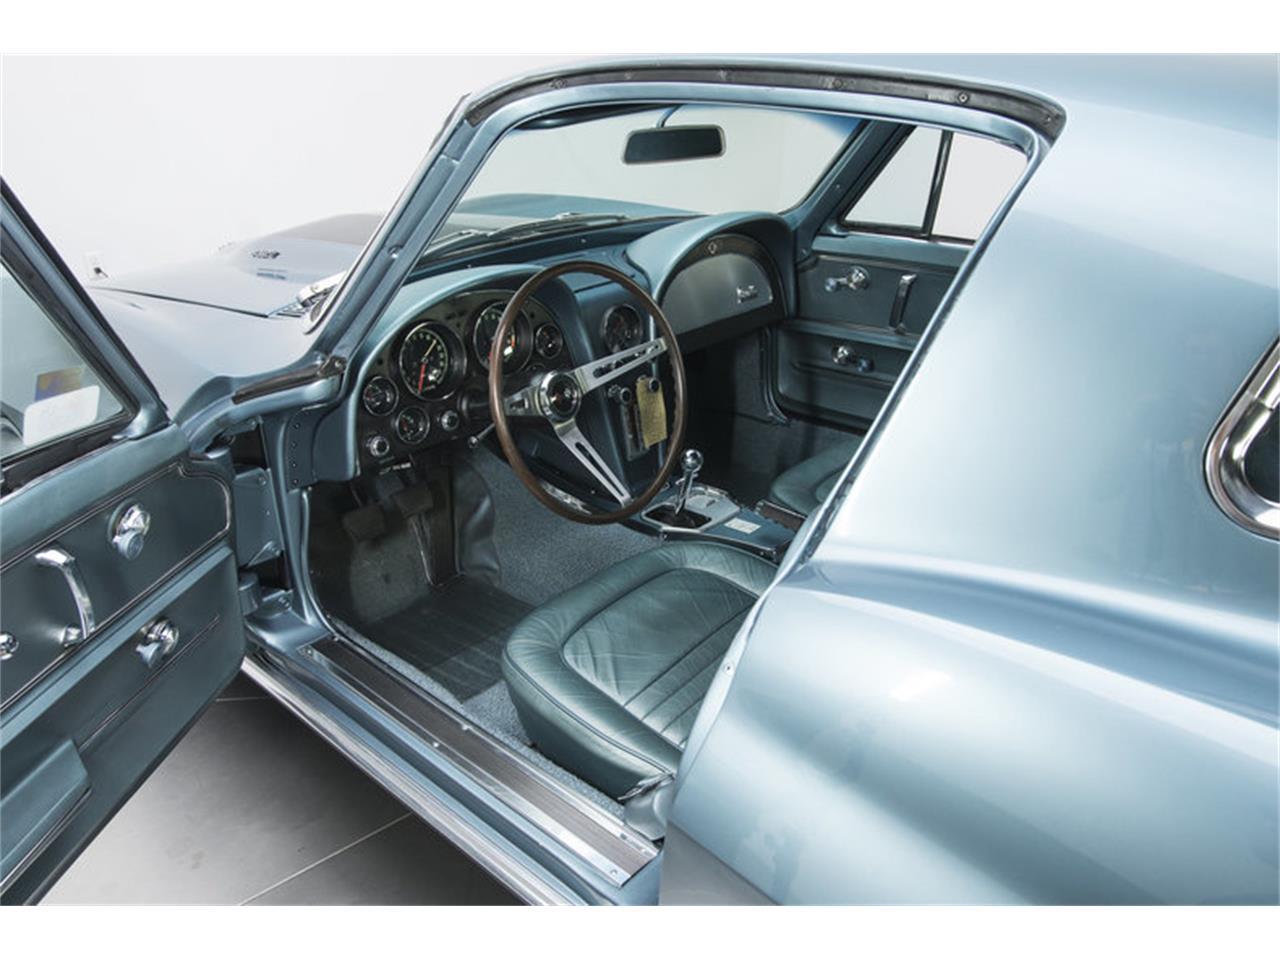 Large Picture of Classic 1967 Chevrolet Corvette located in North Carolina - MESF